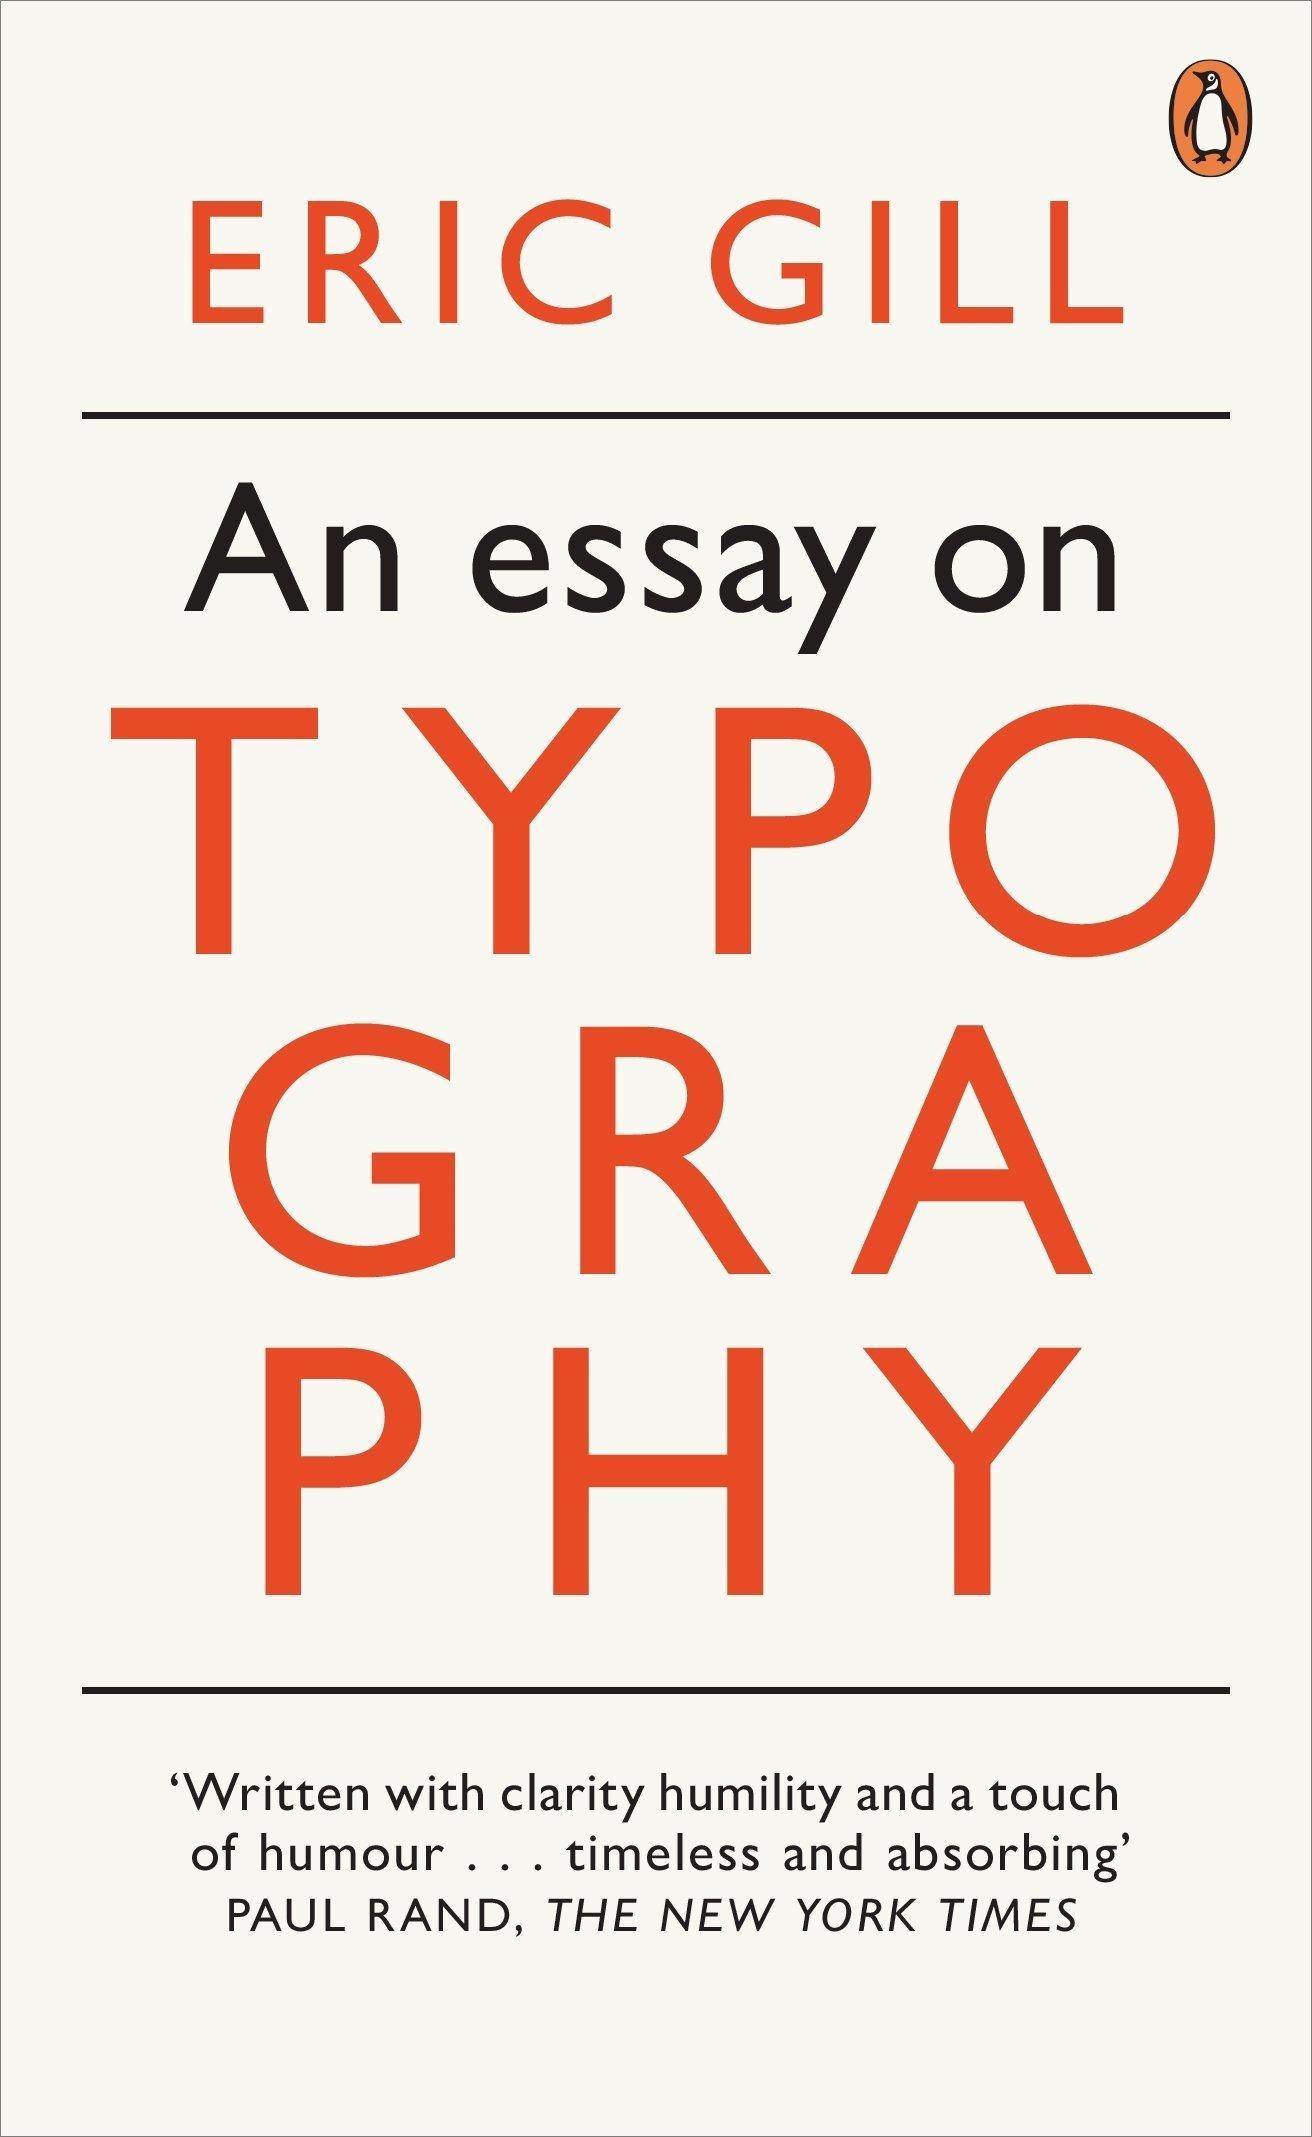 EricGill-EssayOnTypography.jpg